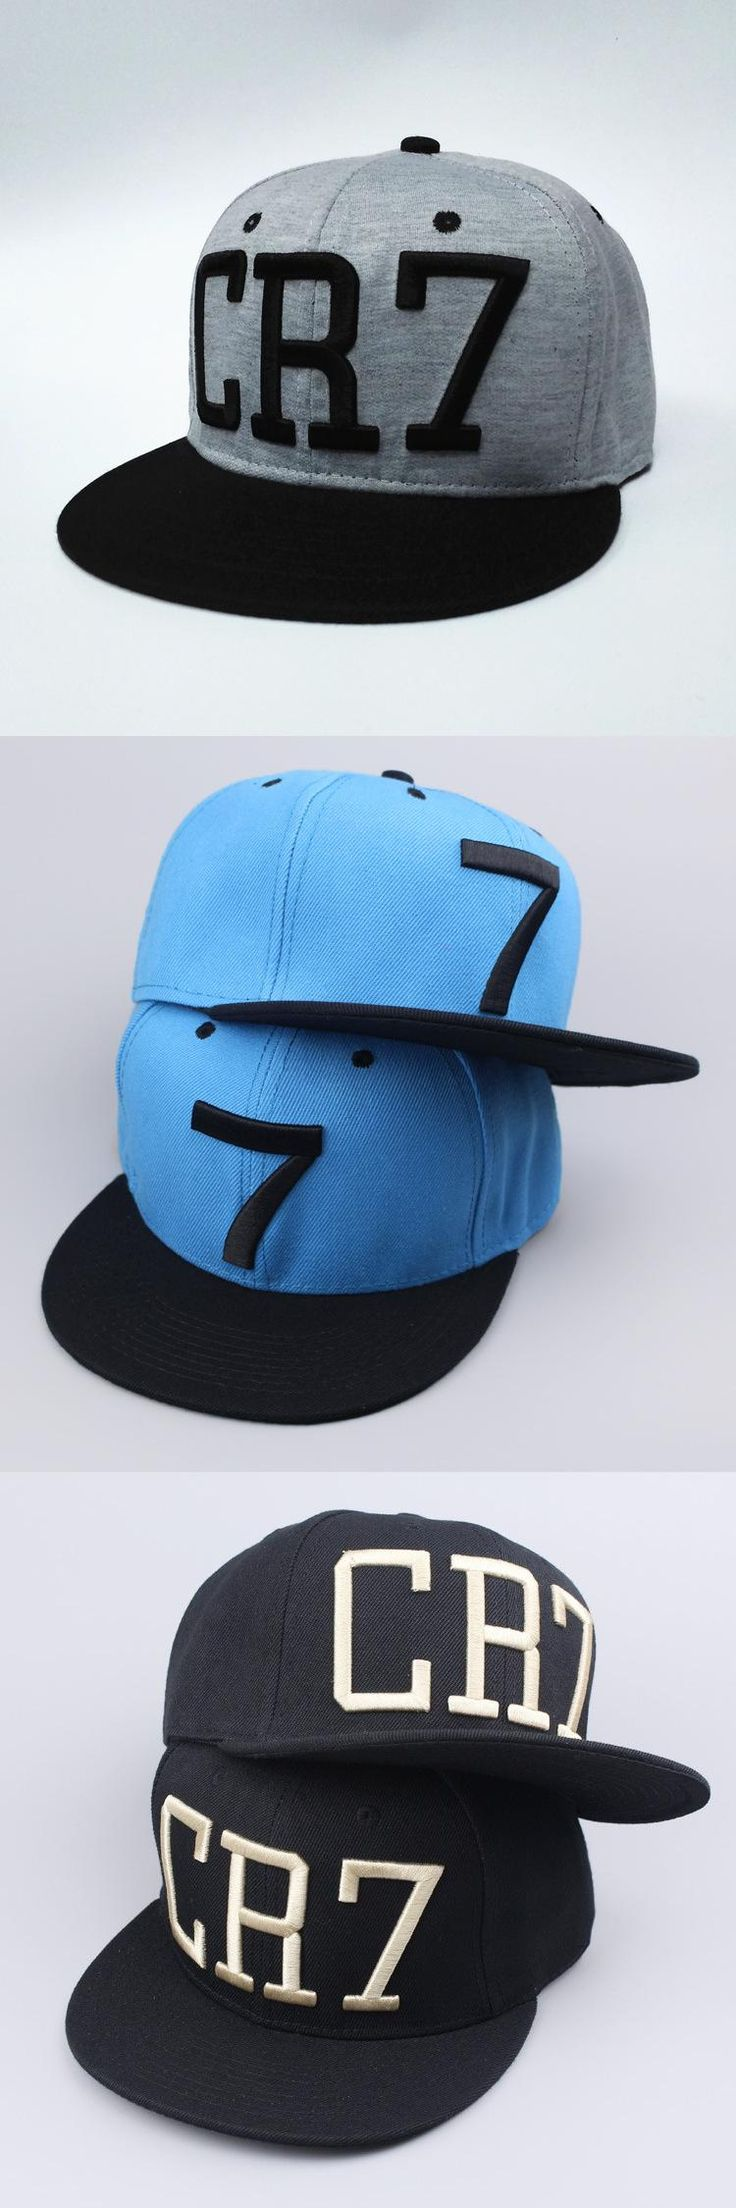 [Visit to Buy] 2016 new Cristiano Ronaldo gray CR7 Baseball Caps hip hop Sports Football hat men&women Snapback cap #Advertisement